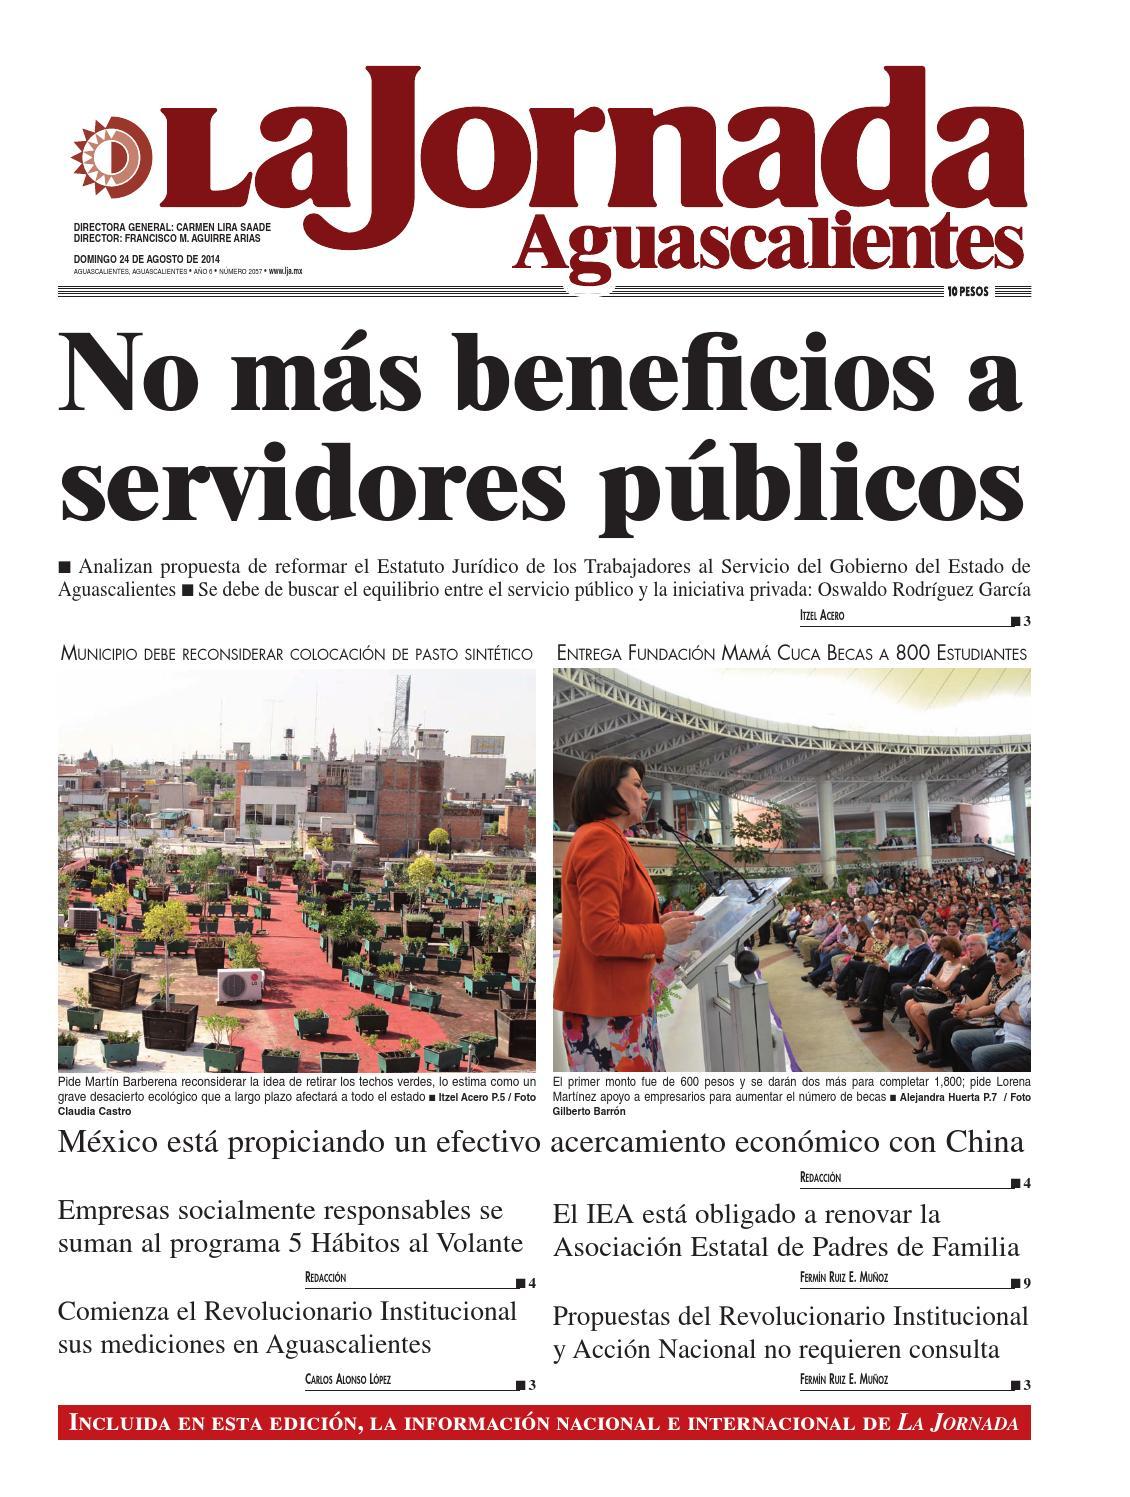 LJA24082014 by La Jornada Aguascalientes - issuu